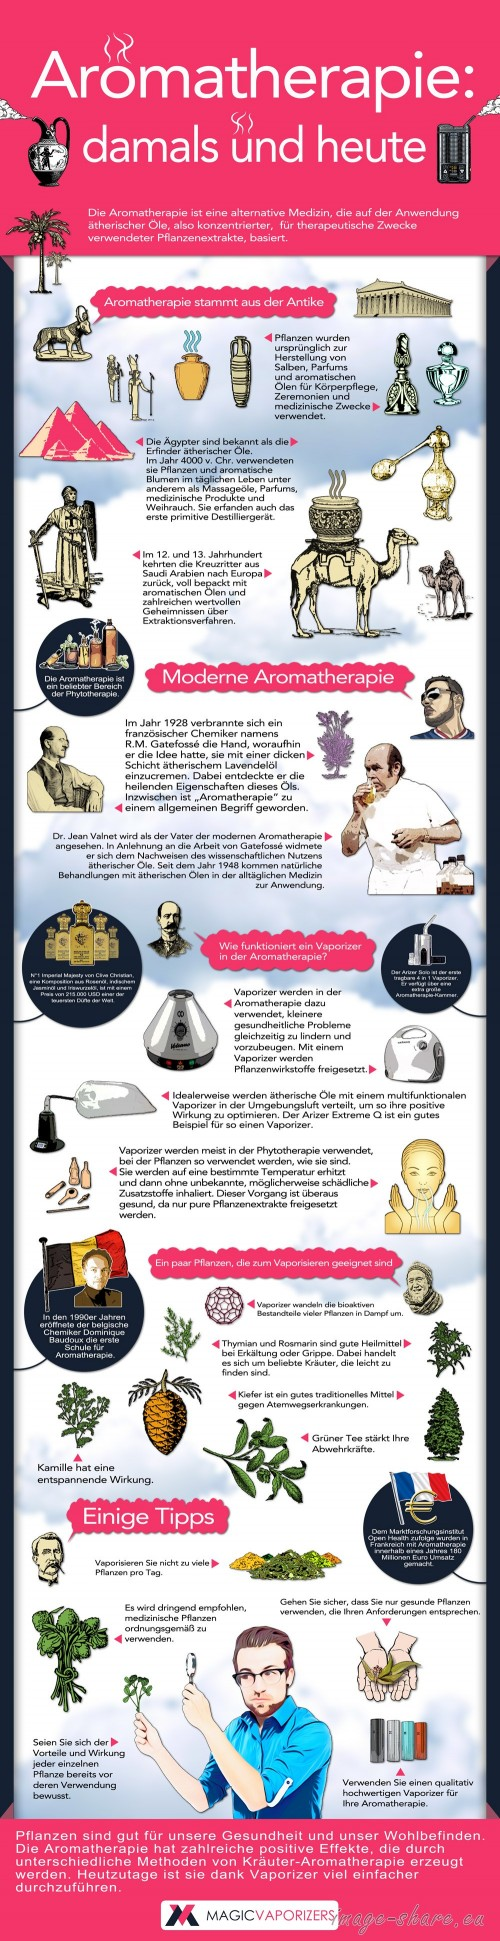 Aromaterapie-damalsundheuter.jpg